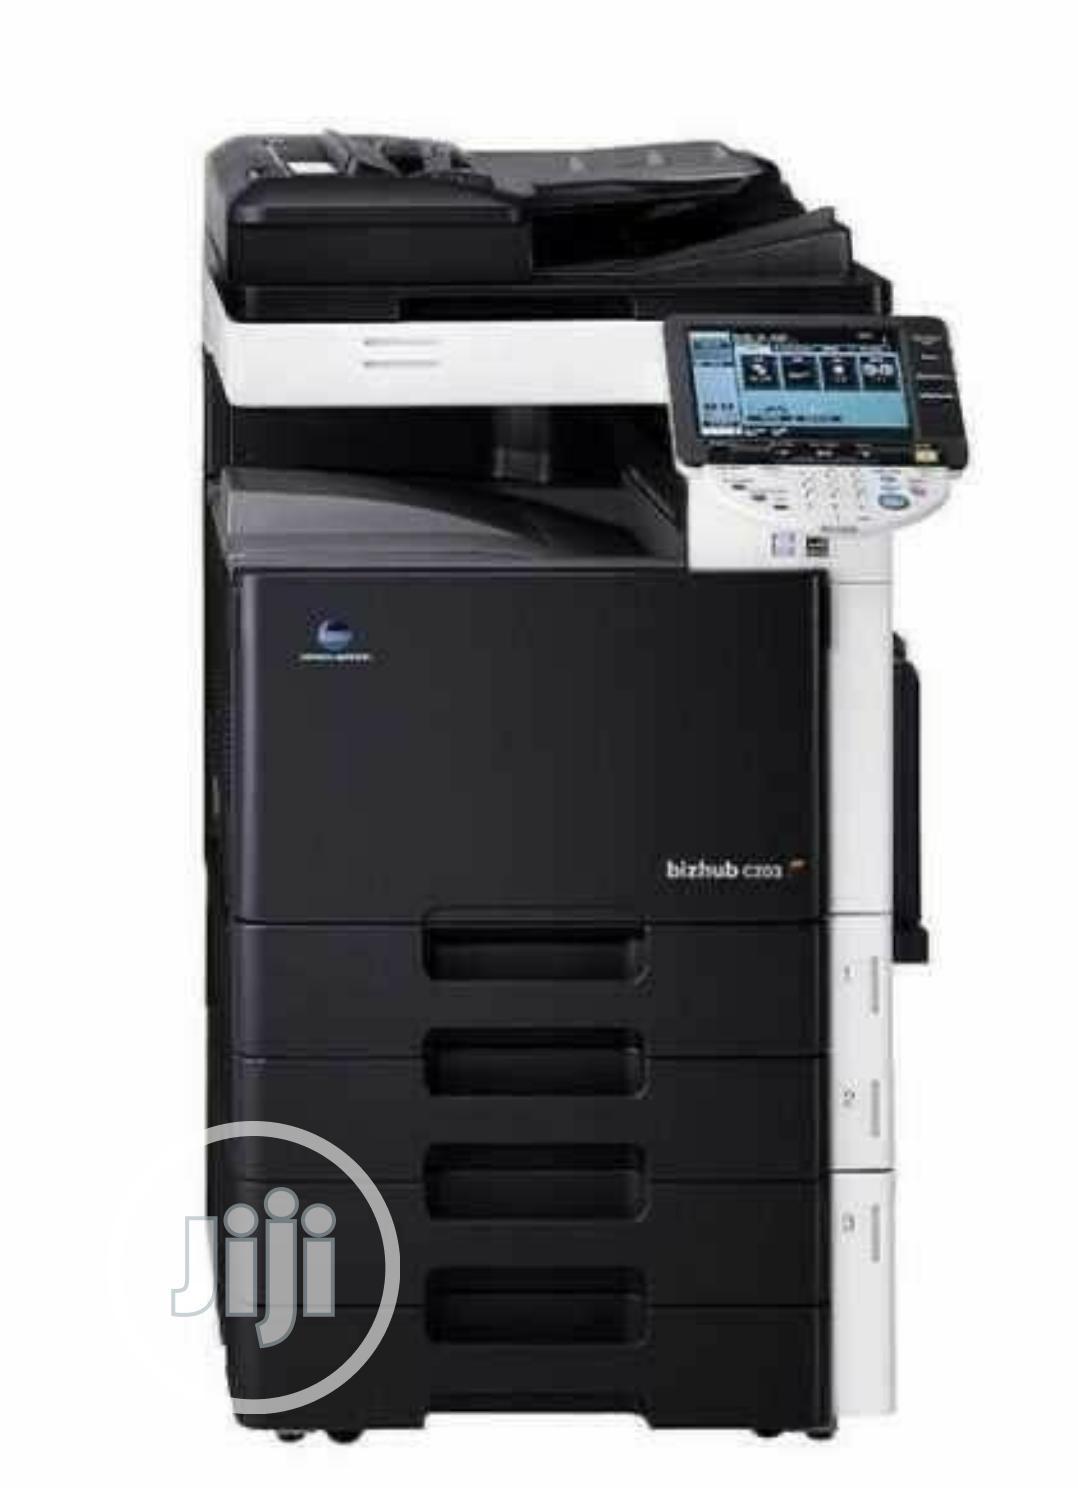 Bizhub C203 Konica Minolta Direct Image Printer